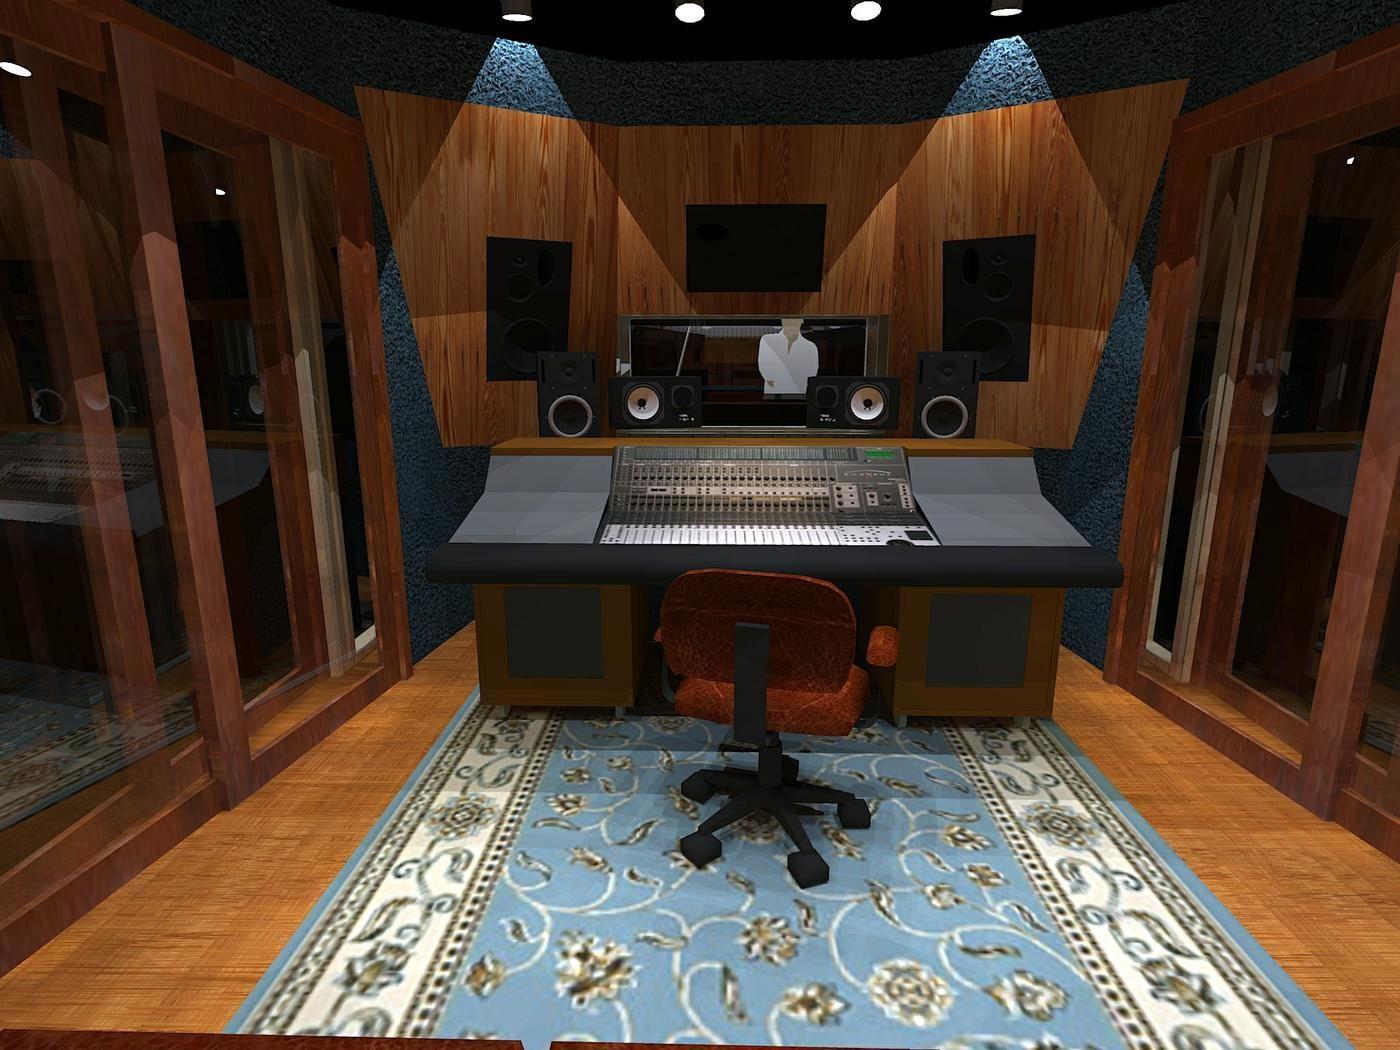 Pin by Paul Dant on Recording Studio Design   Recording ...